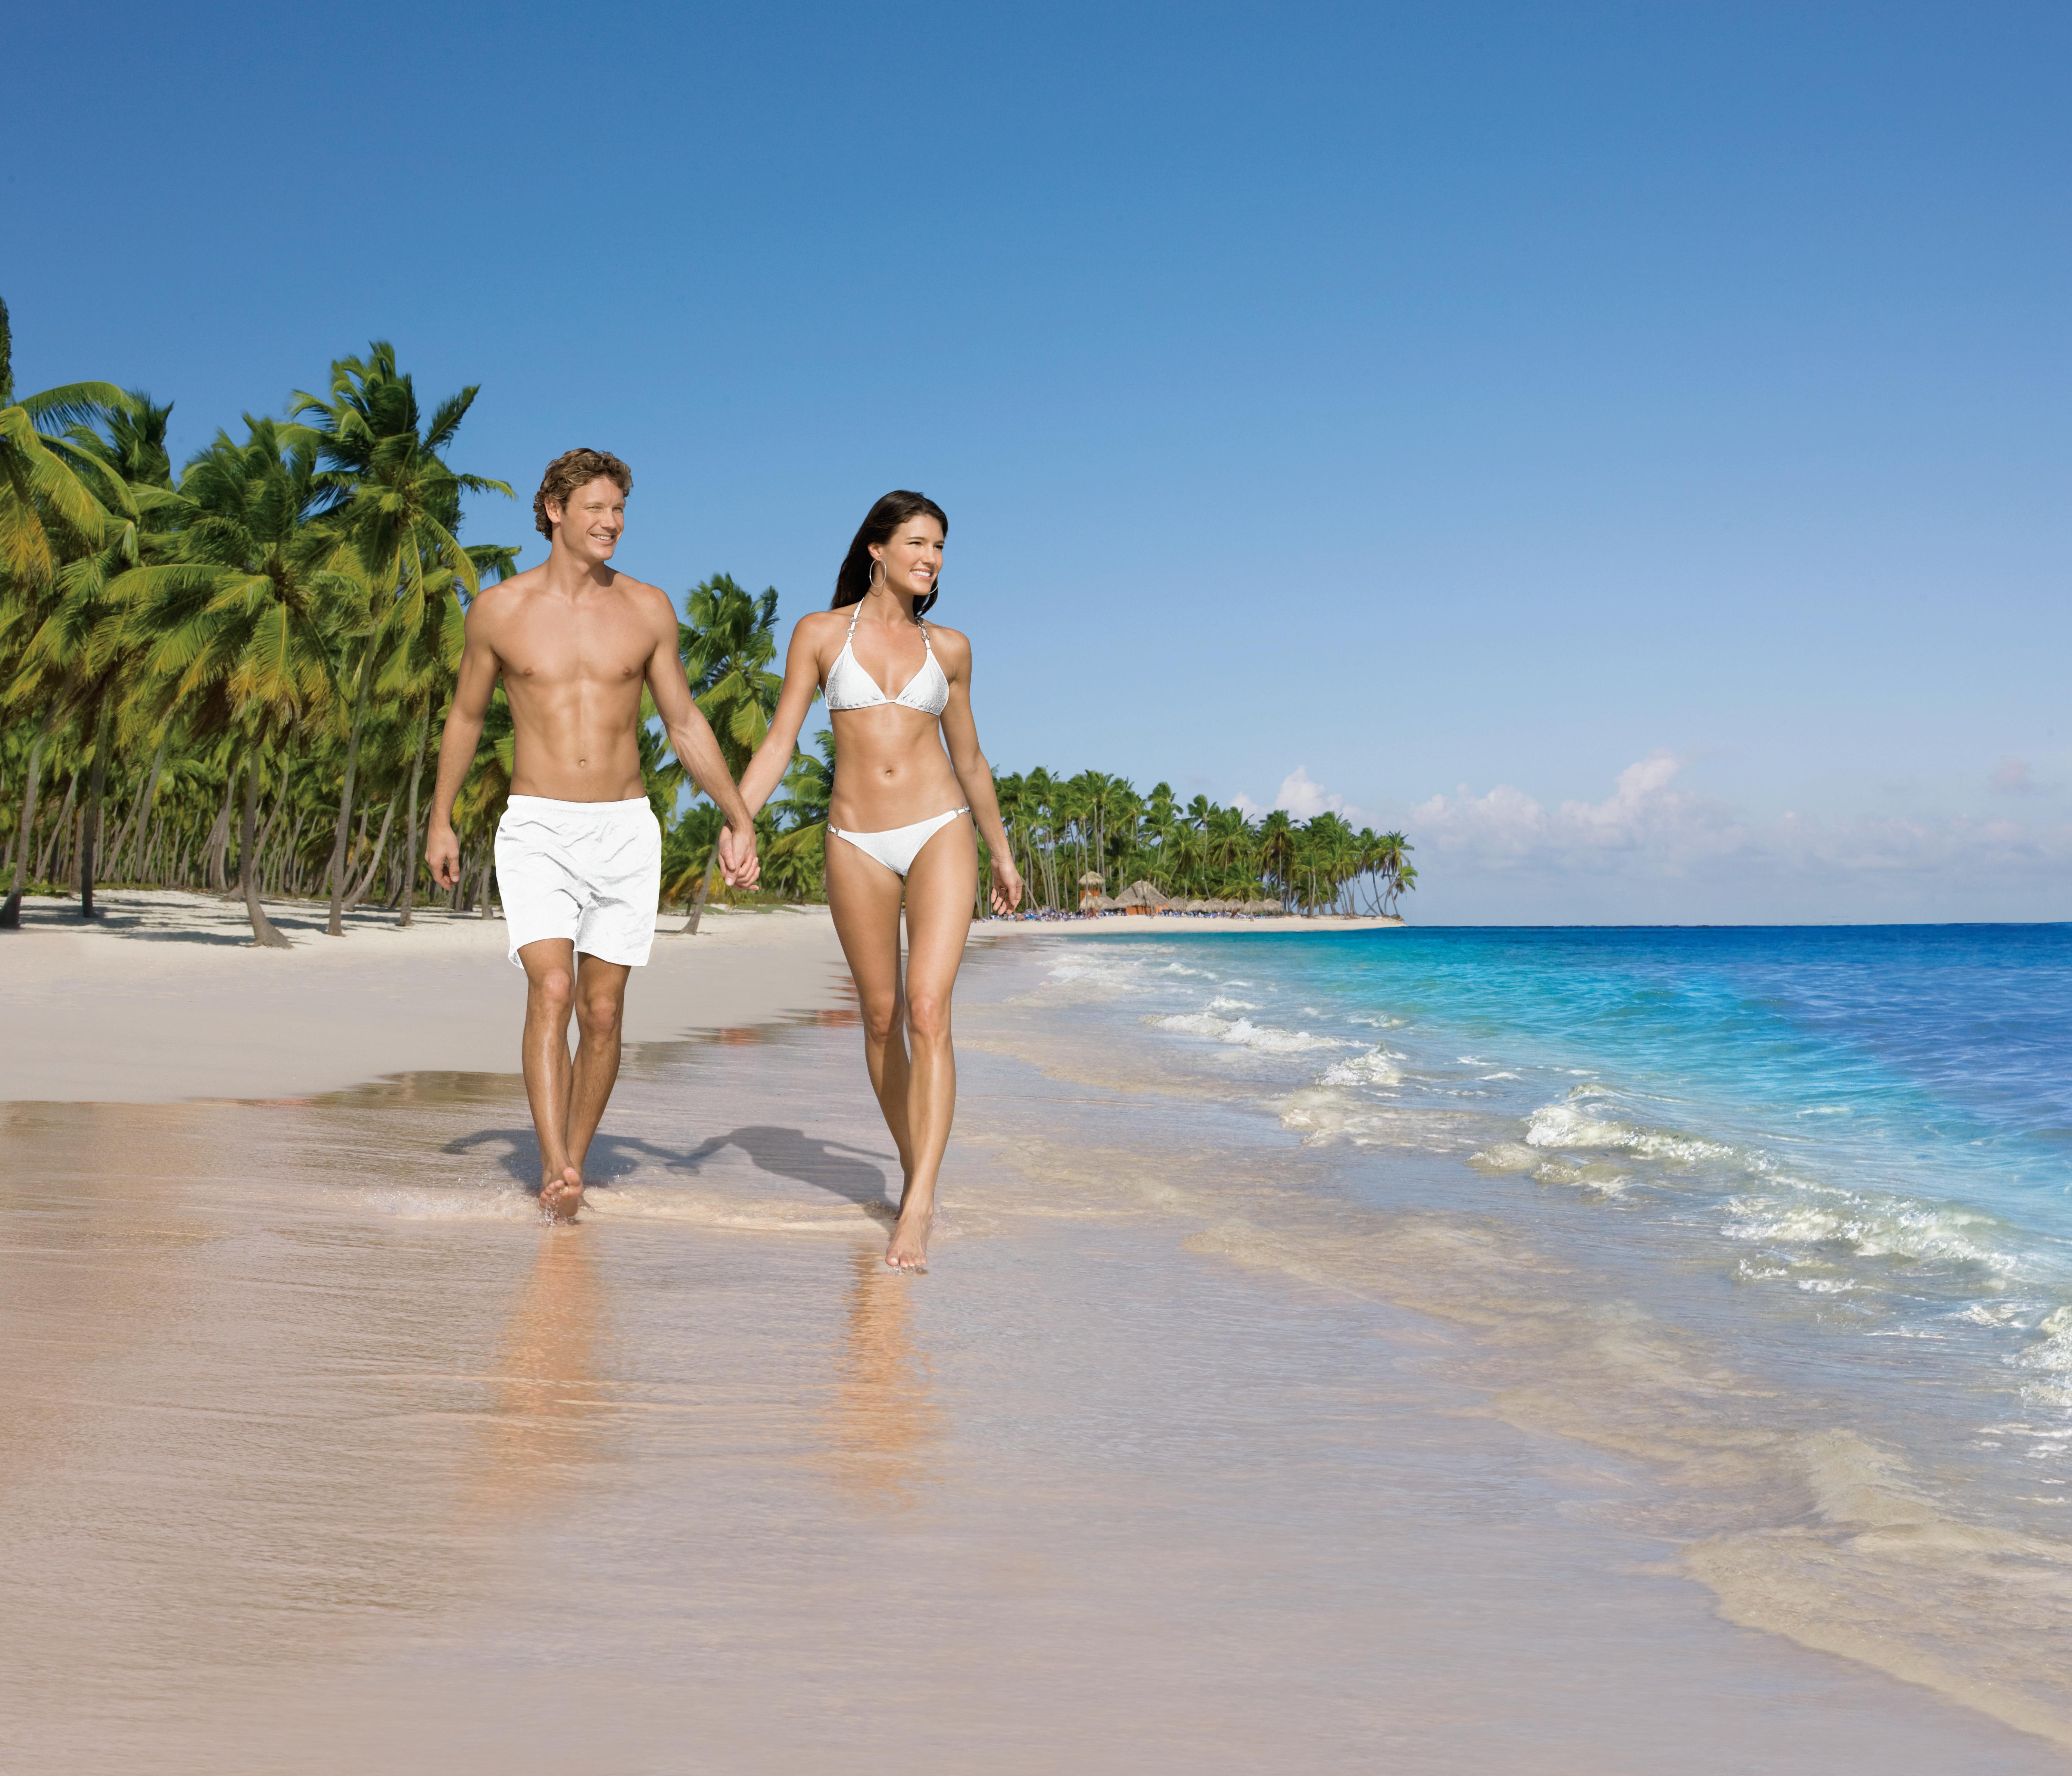 Travel Agency All-Inclusive Resort Dreams Palm Beach 07